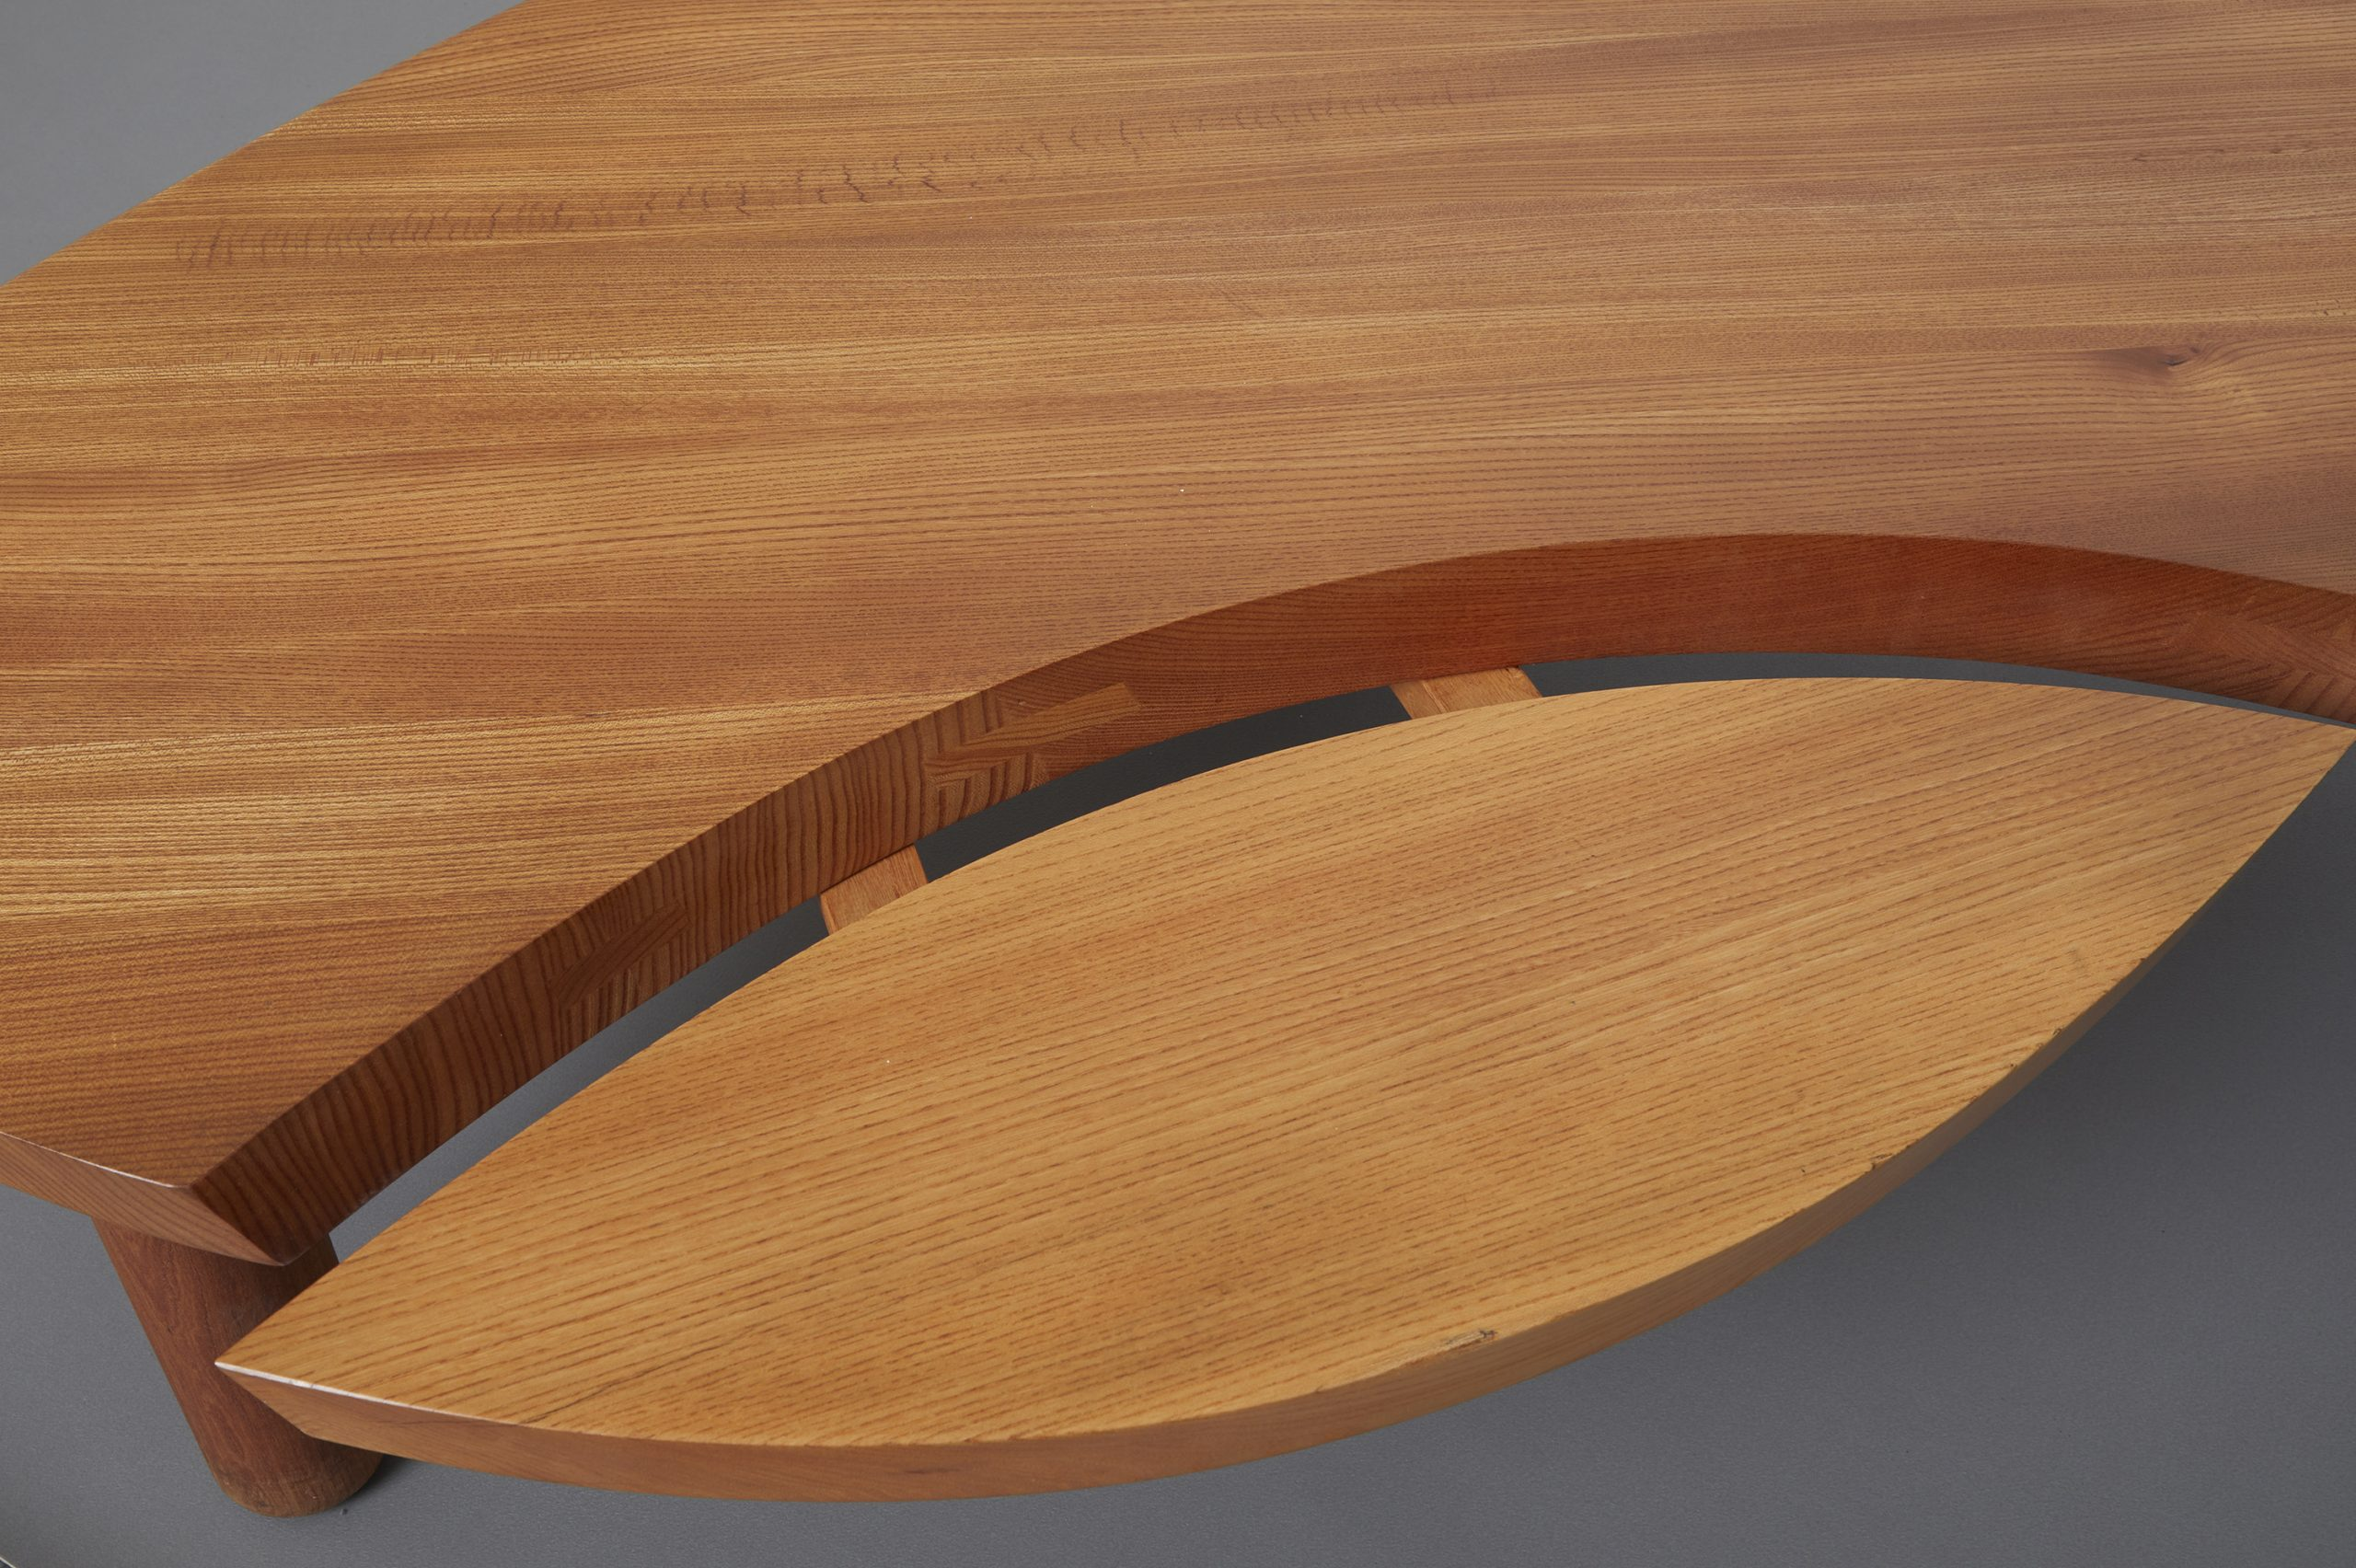 single-elmwood-low-table-t22-by-pierre-chapo-image-07